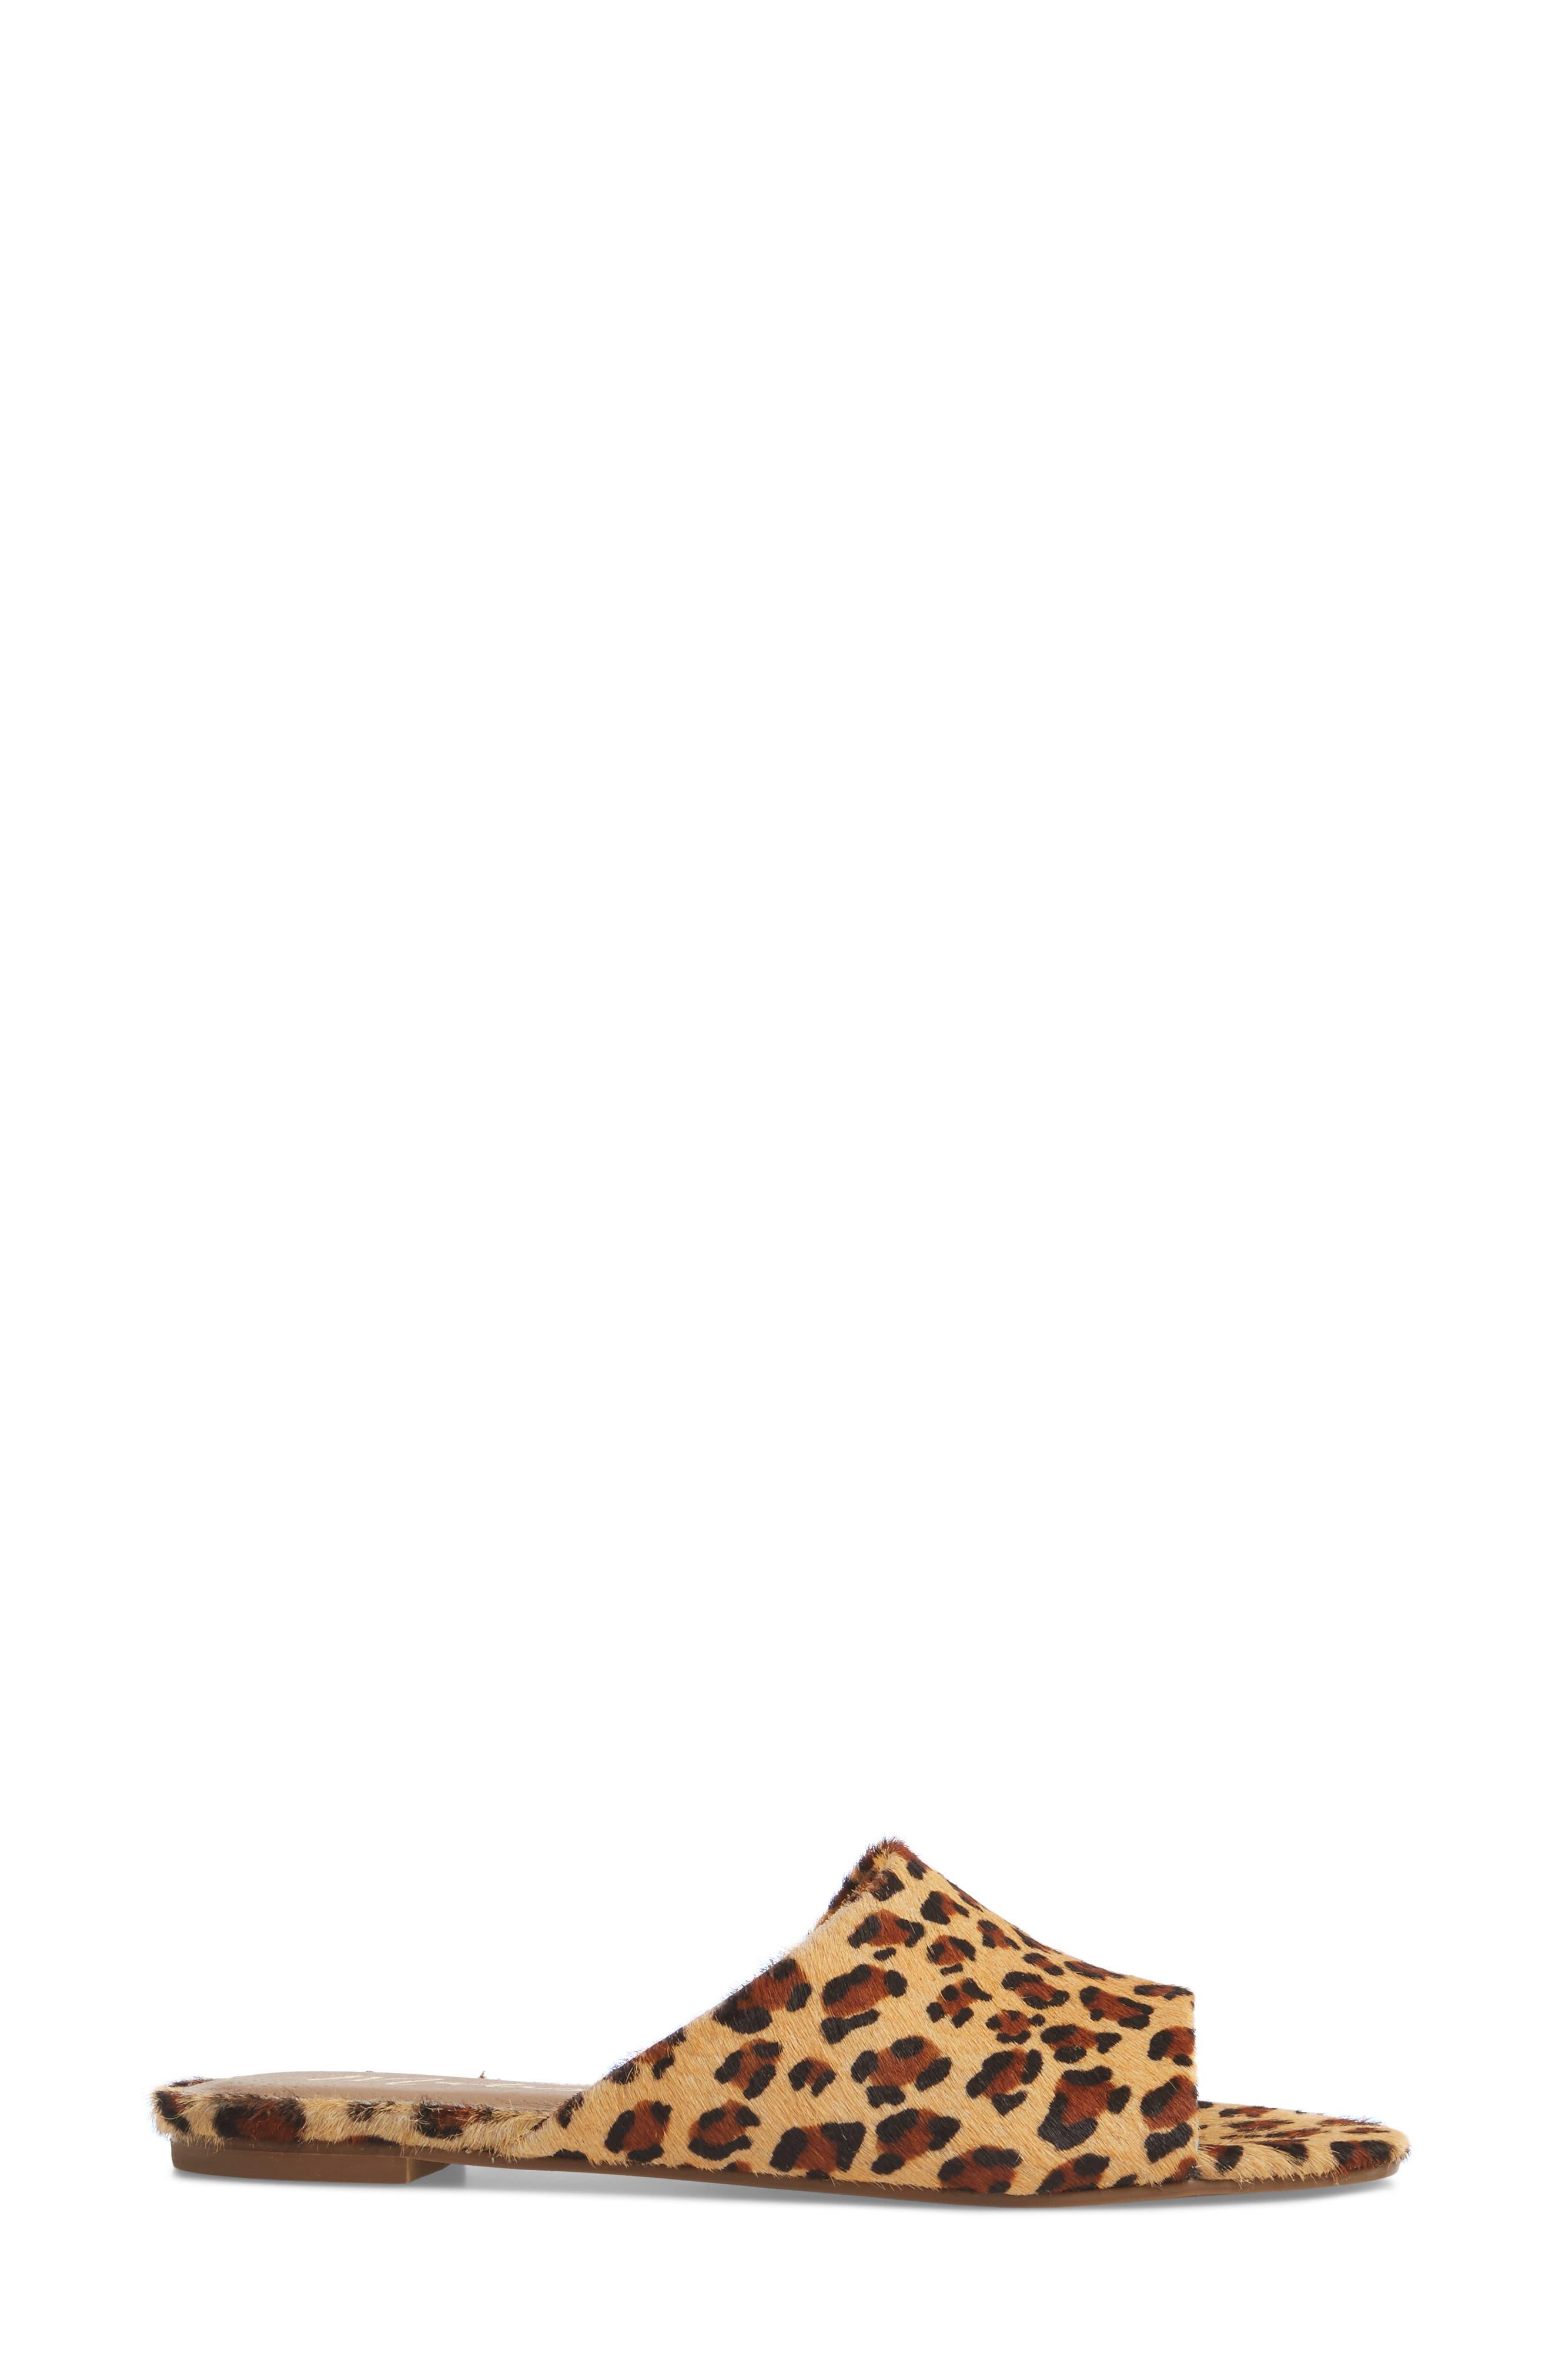 Lira Genuine Calf Hair Sandal,                             Alternate thumbnail 3, color,                             LEOPARD LEATHER